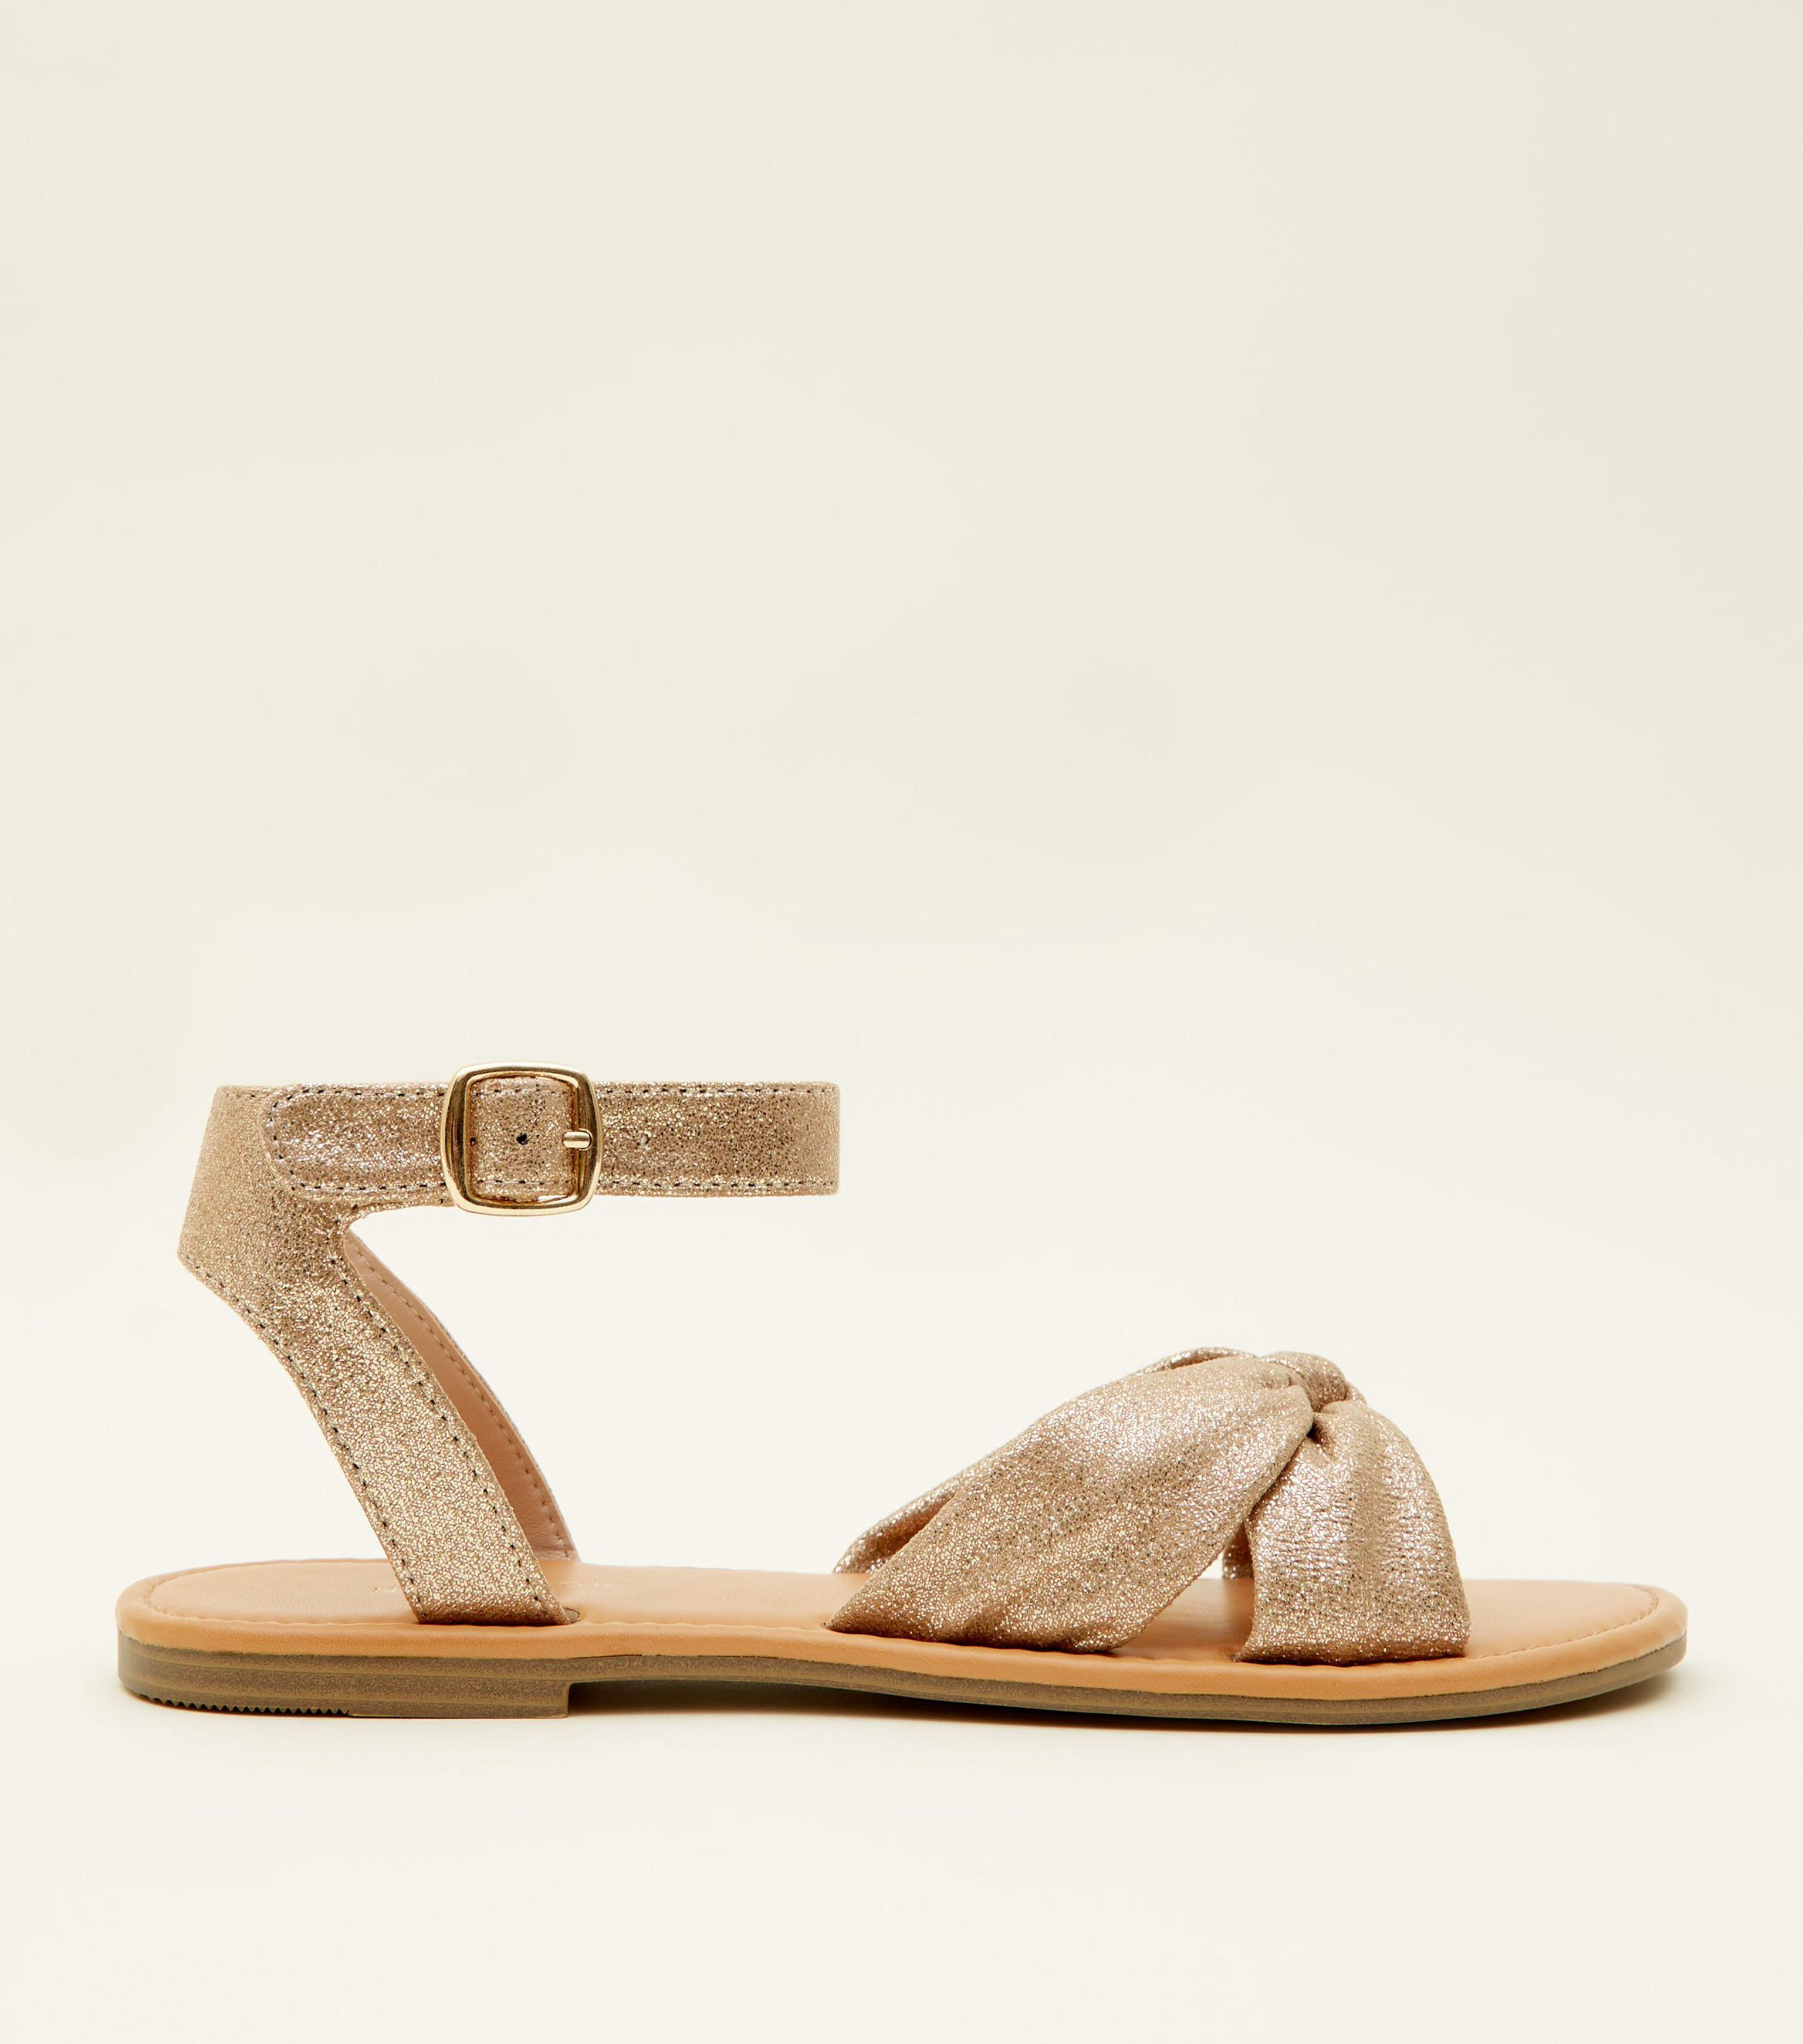 429094ae18d New Look Gold Glitter Bow Strap Flat Sandals in Metallic - Lyst